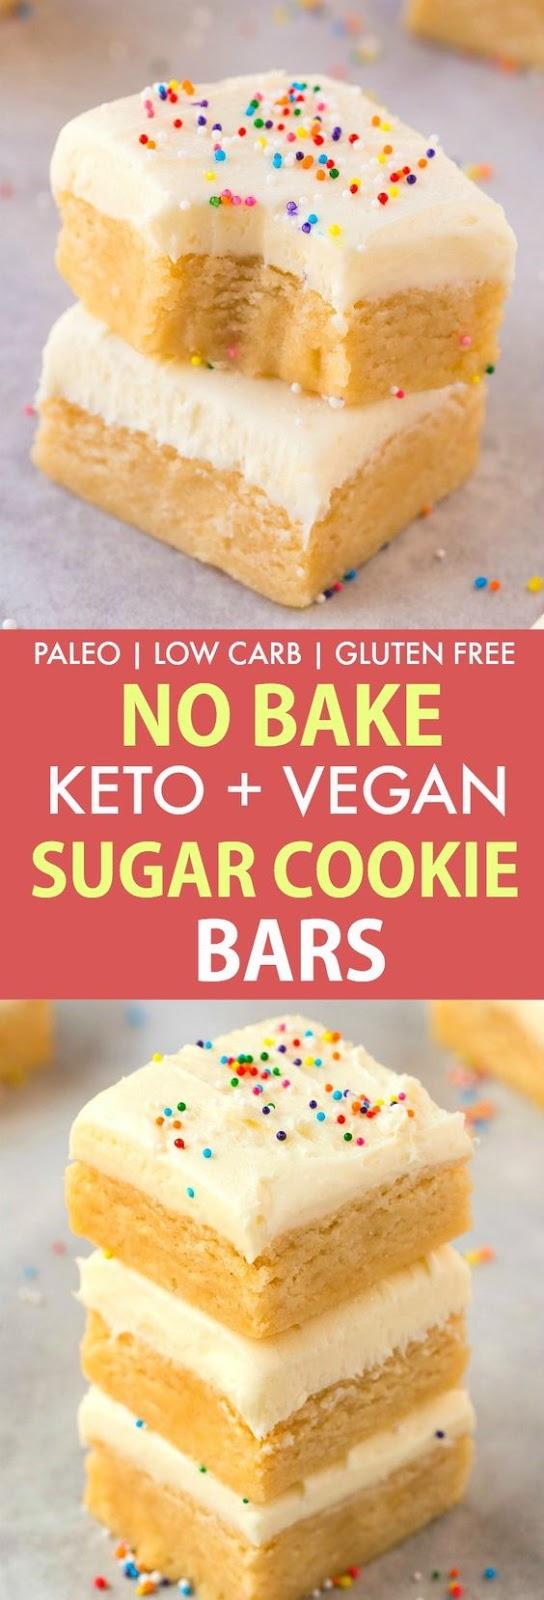 Keto Low Carb No Bake Sugar Cookie Bars Recipe